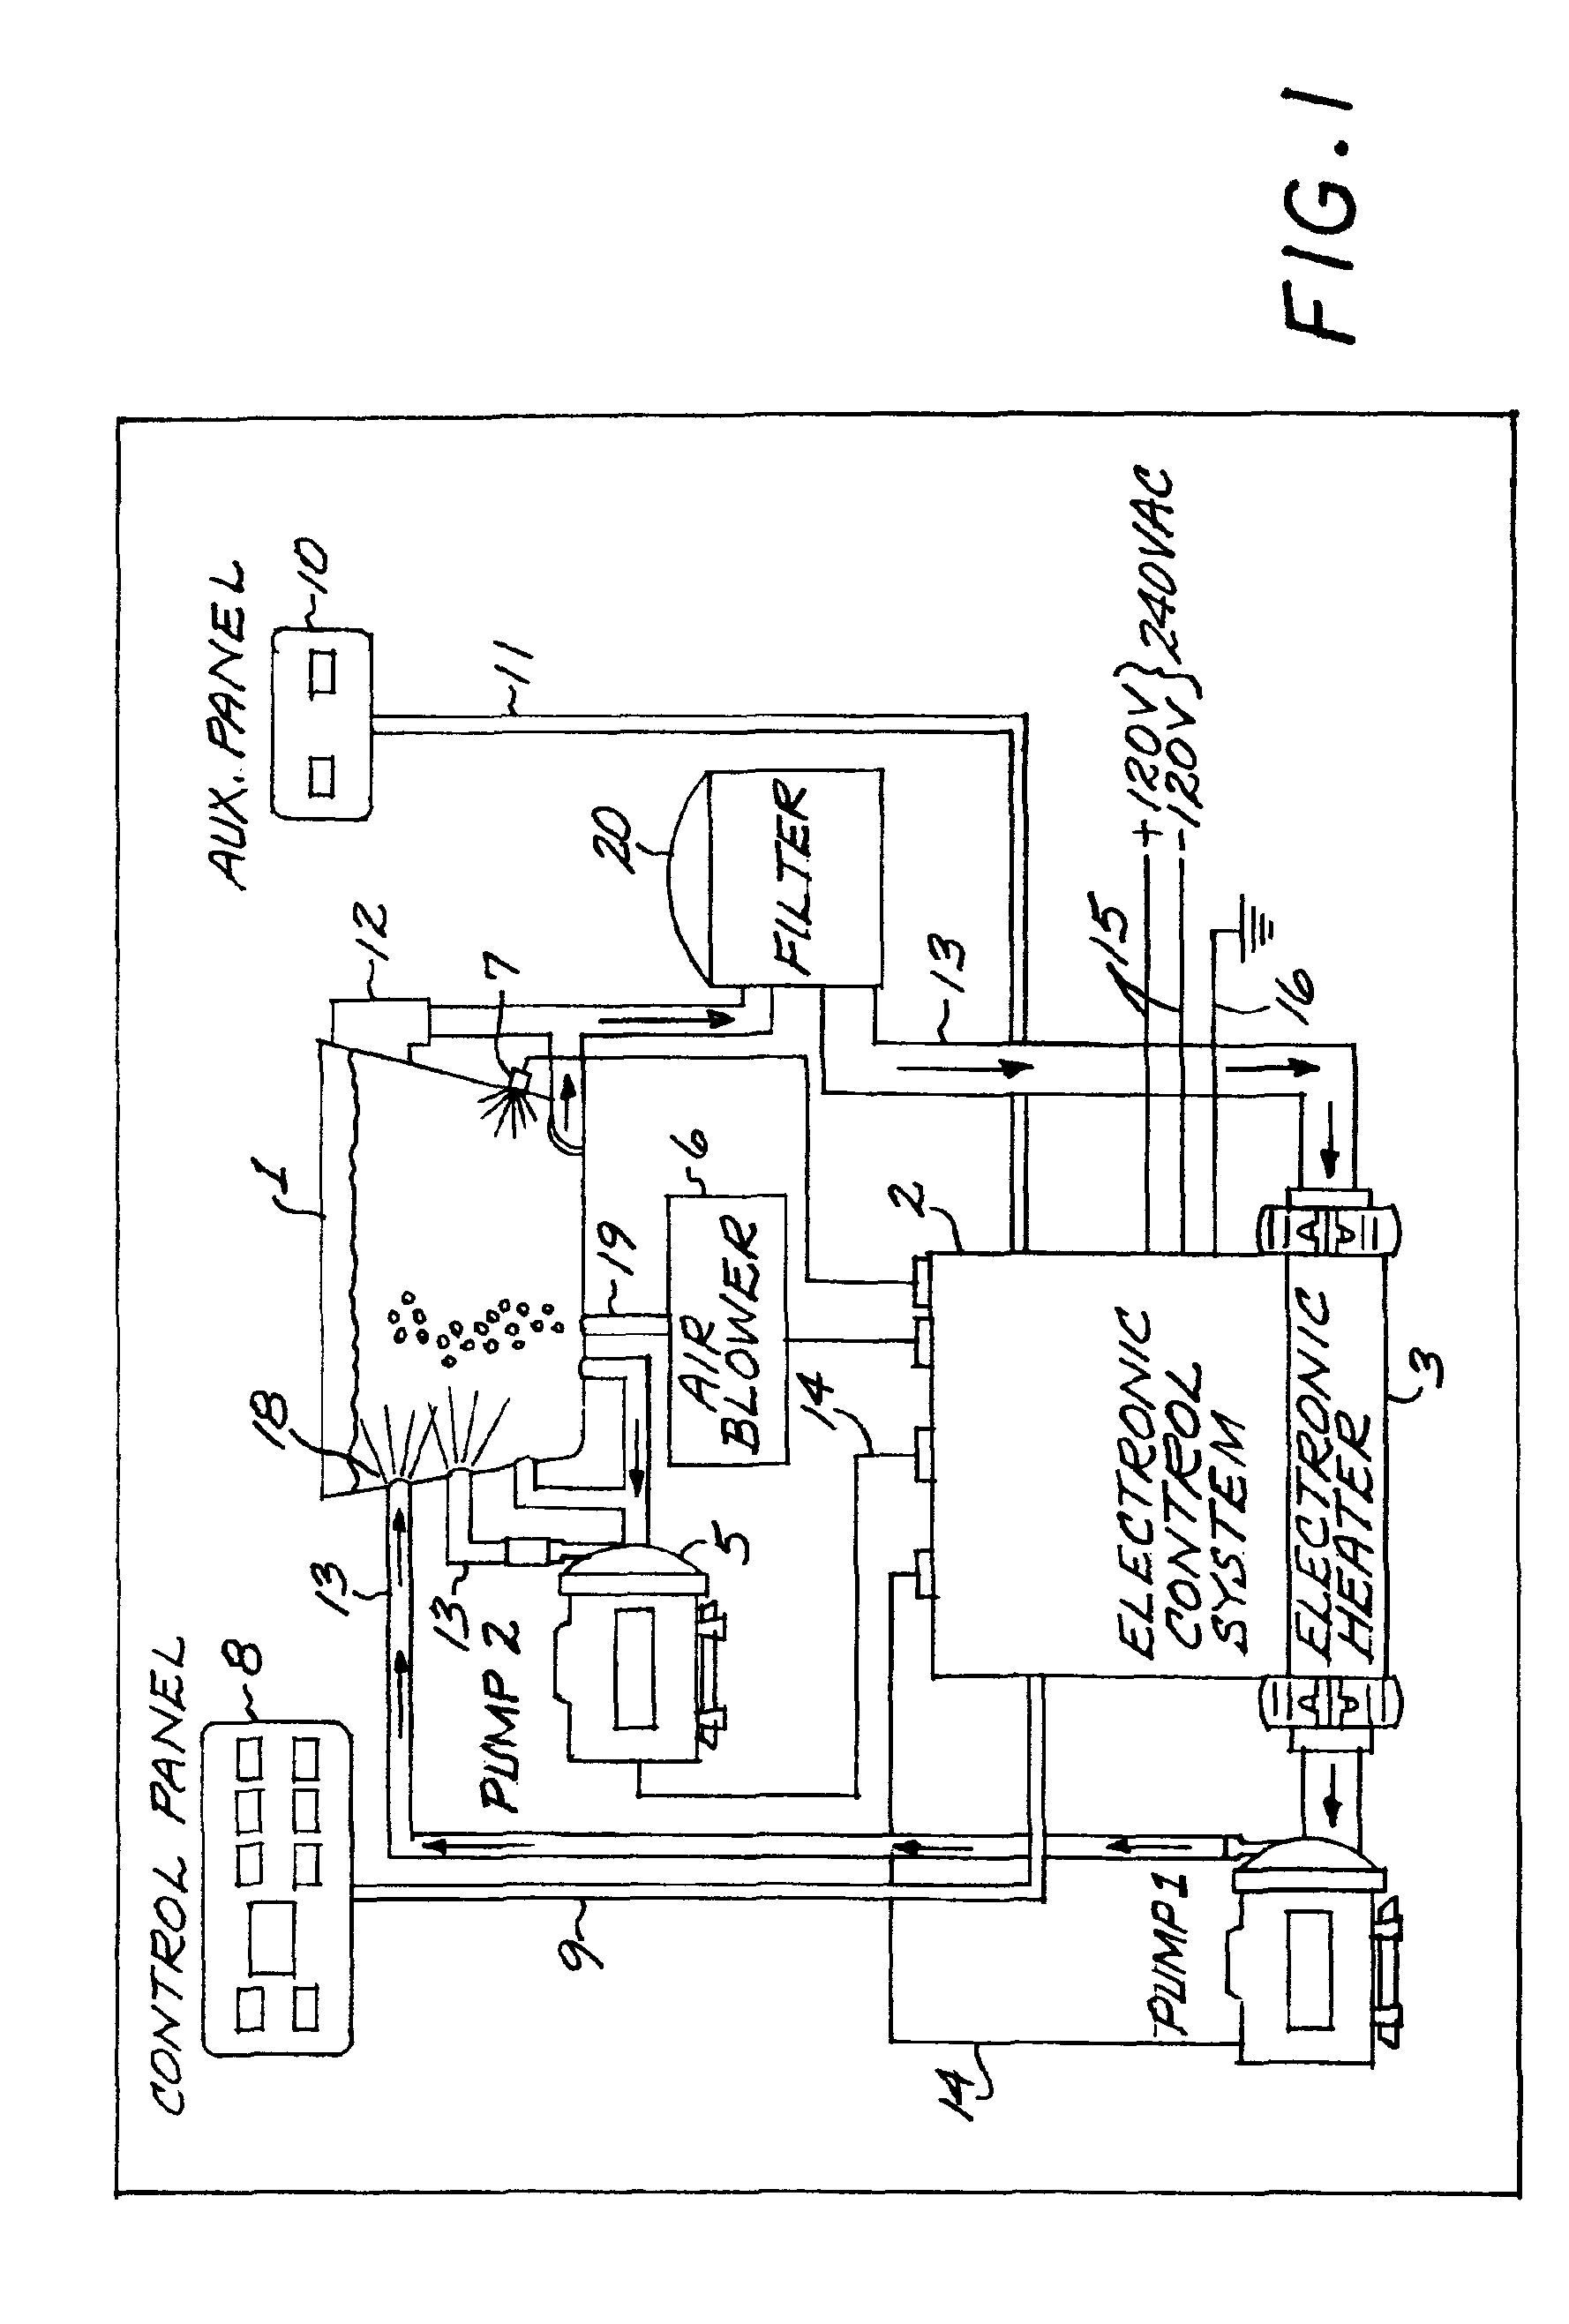 Cal Spa Pump Wiring Diagram